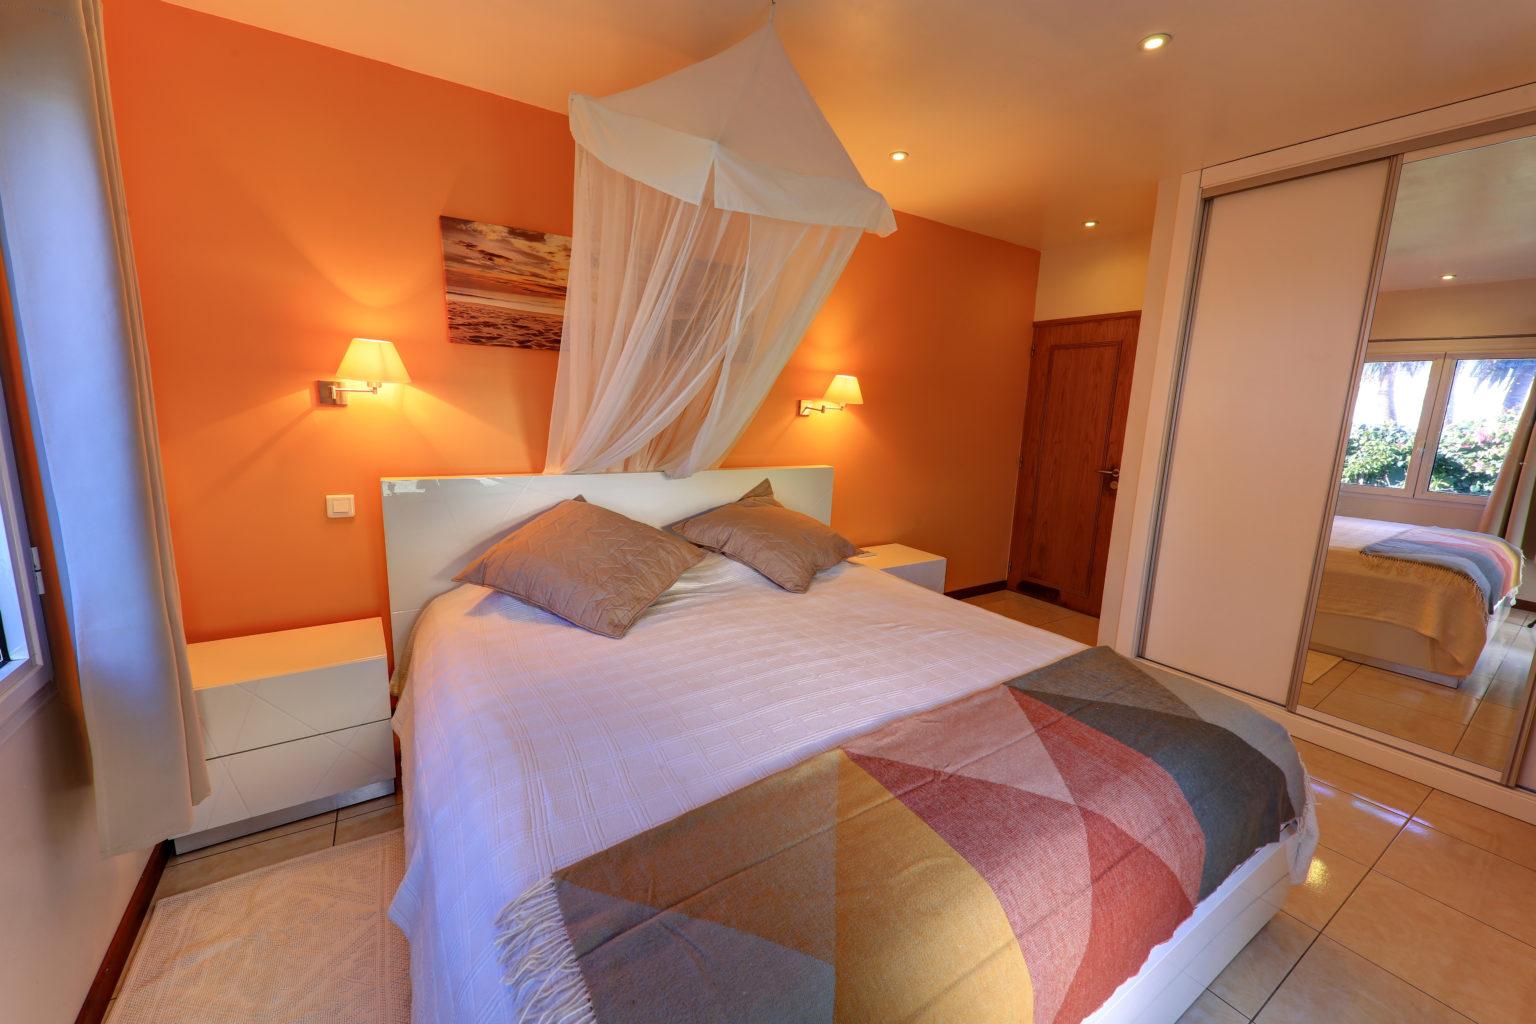 Villa Les Raisiniers - Beachfront Villa for Rent St Barth with Pool - Bedroom